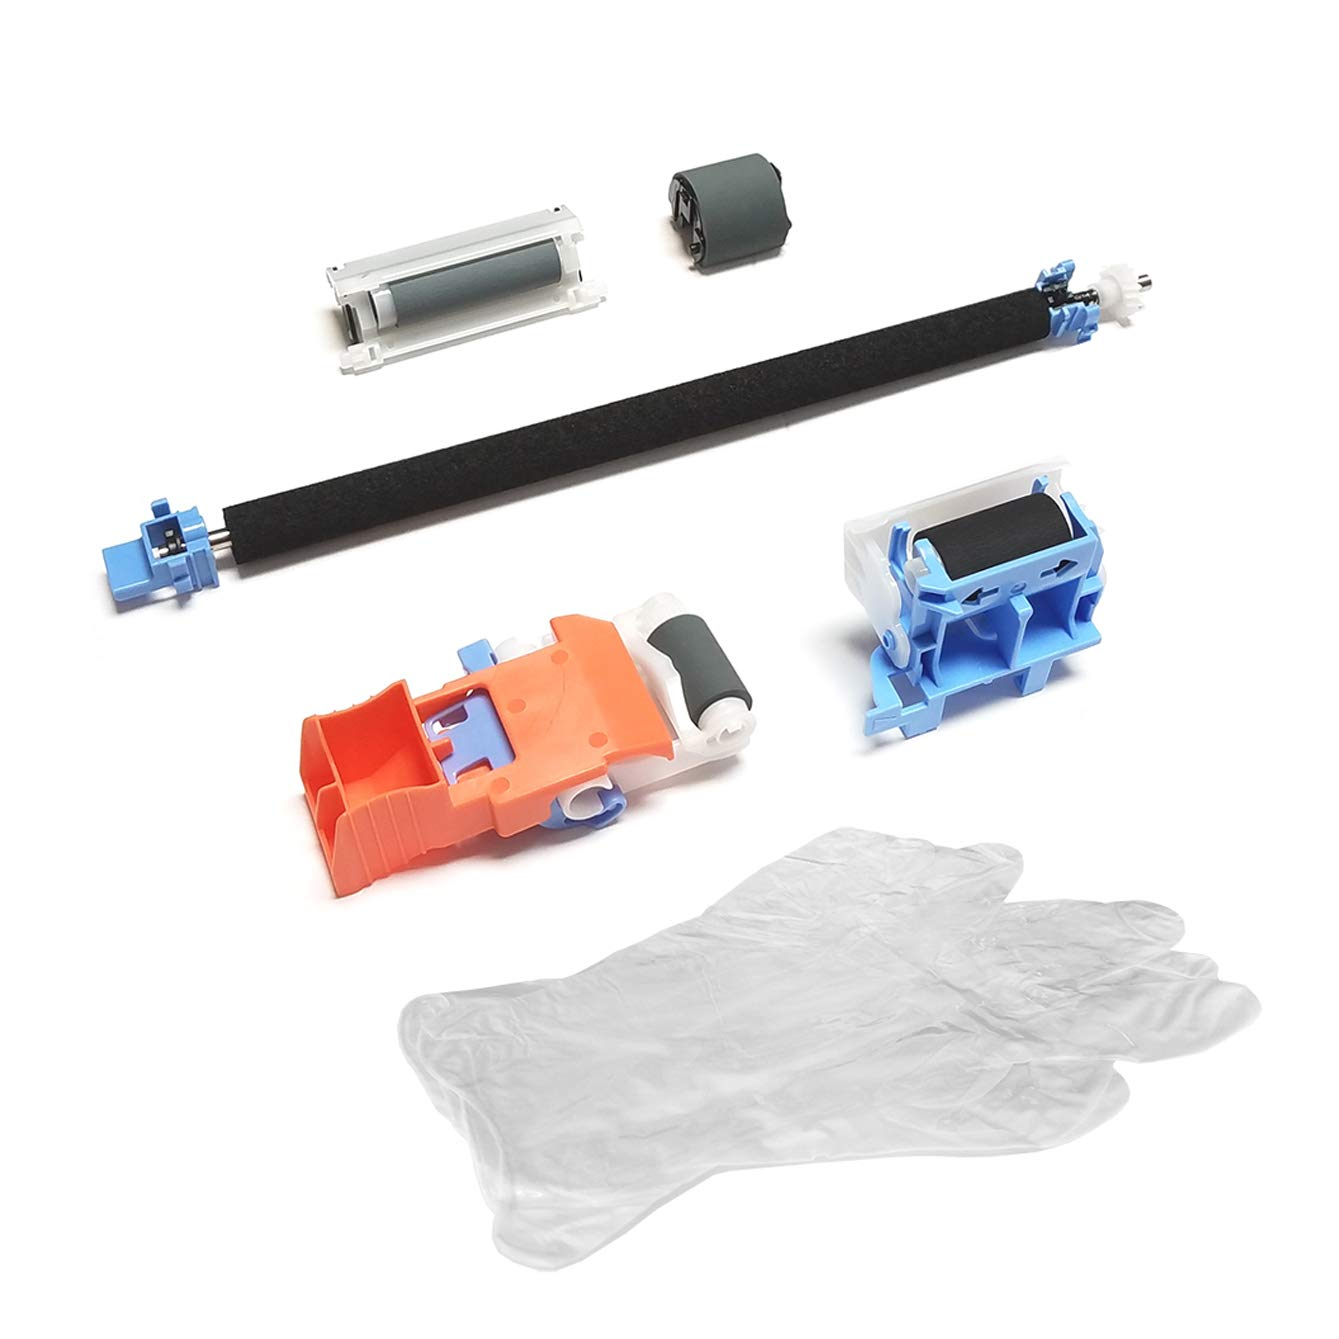 Altru Print M607-RK1-AP Roller Maintenance Kit for HP Laserjet M607, M608, M609, M631, M632, M633 (110V) Includes RM2-6800 Transfer Roller, J8J70-67903 MP Tray & 1 Set of J8J70-67904 for Tray 2-6 by Altru Print (Image #1)